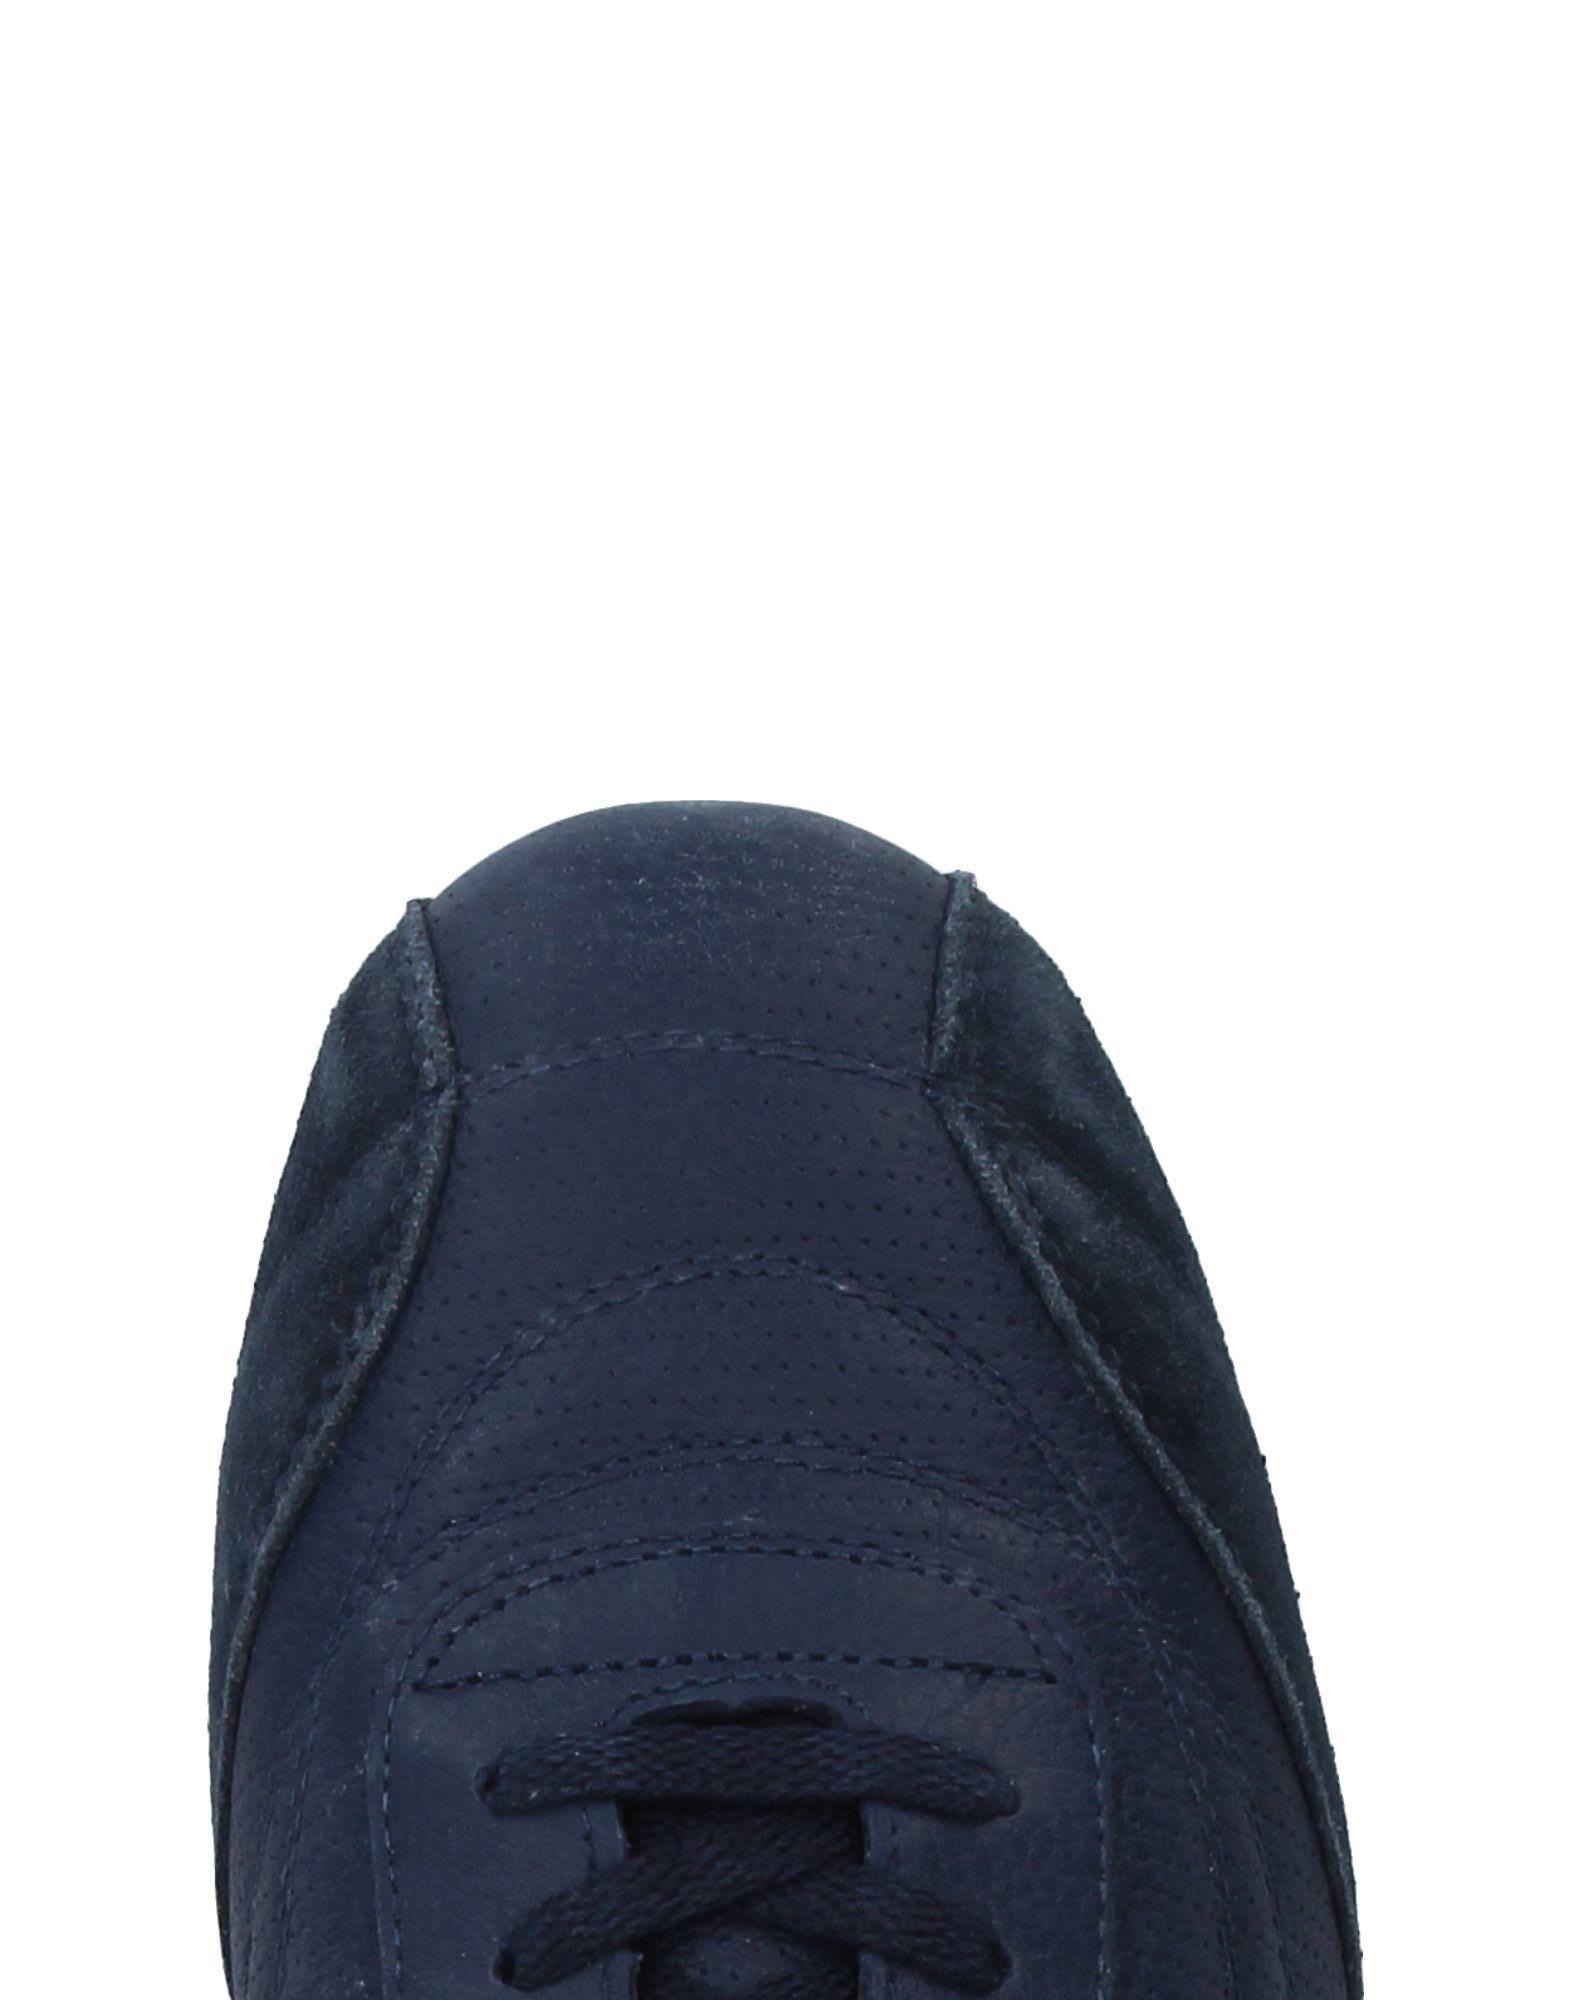 Moda Sneakers Bikkembergs Uomo - 11332334HC 11332334HC 11332334HC 68ba83